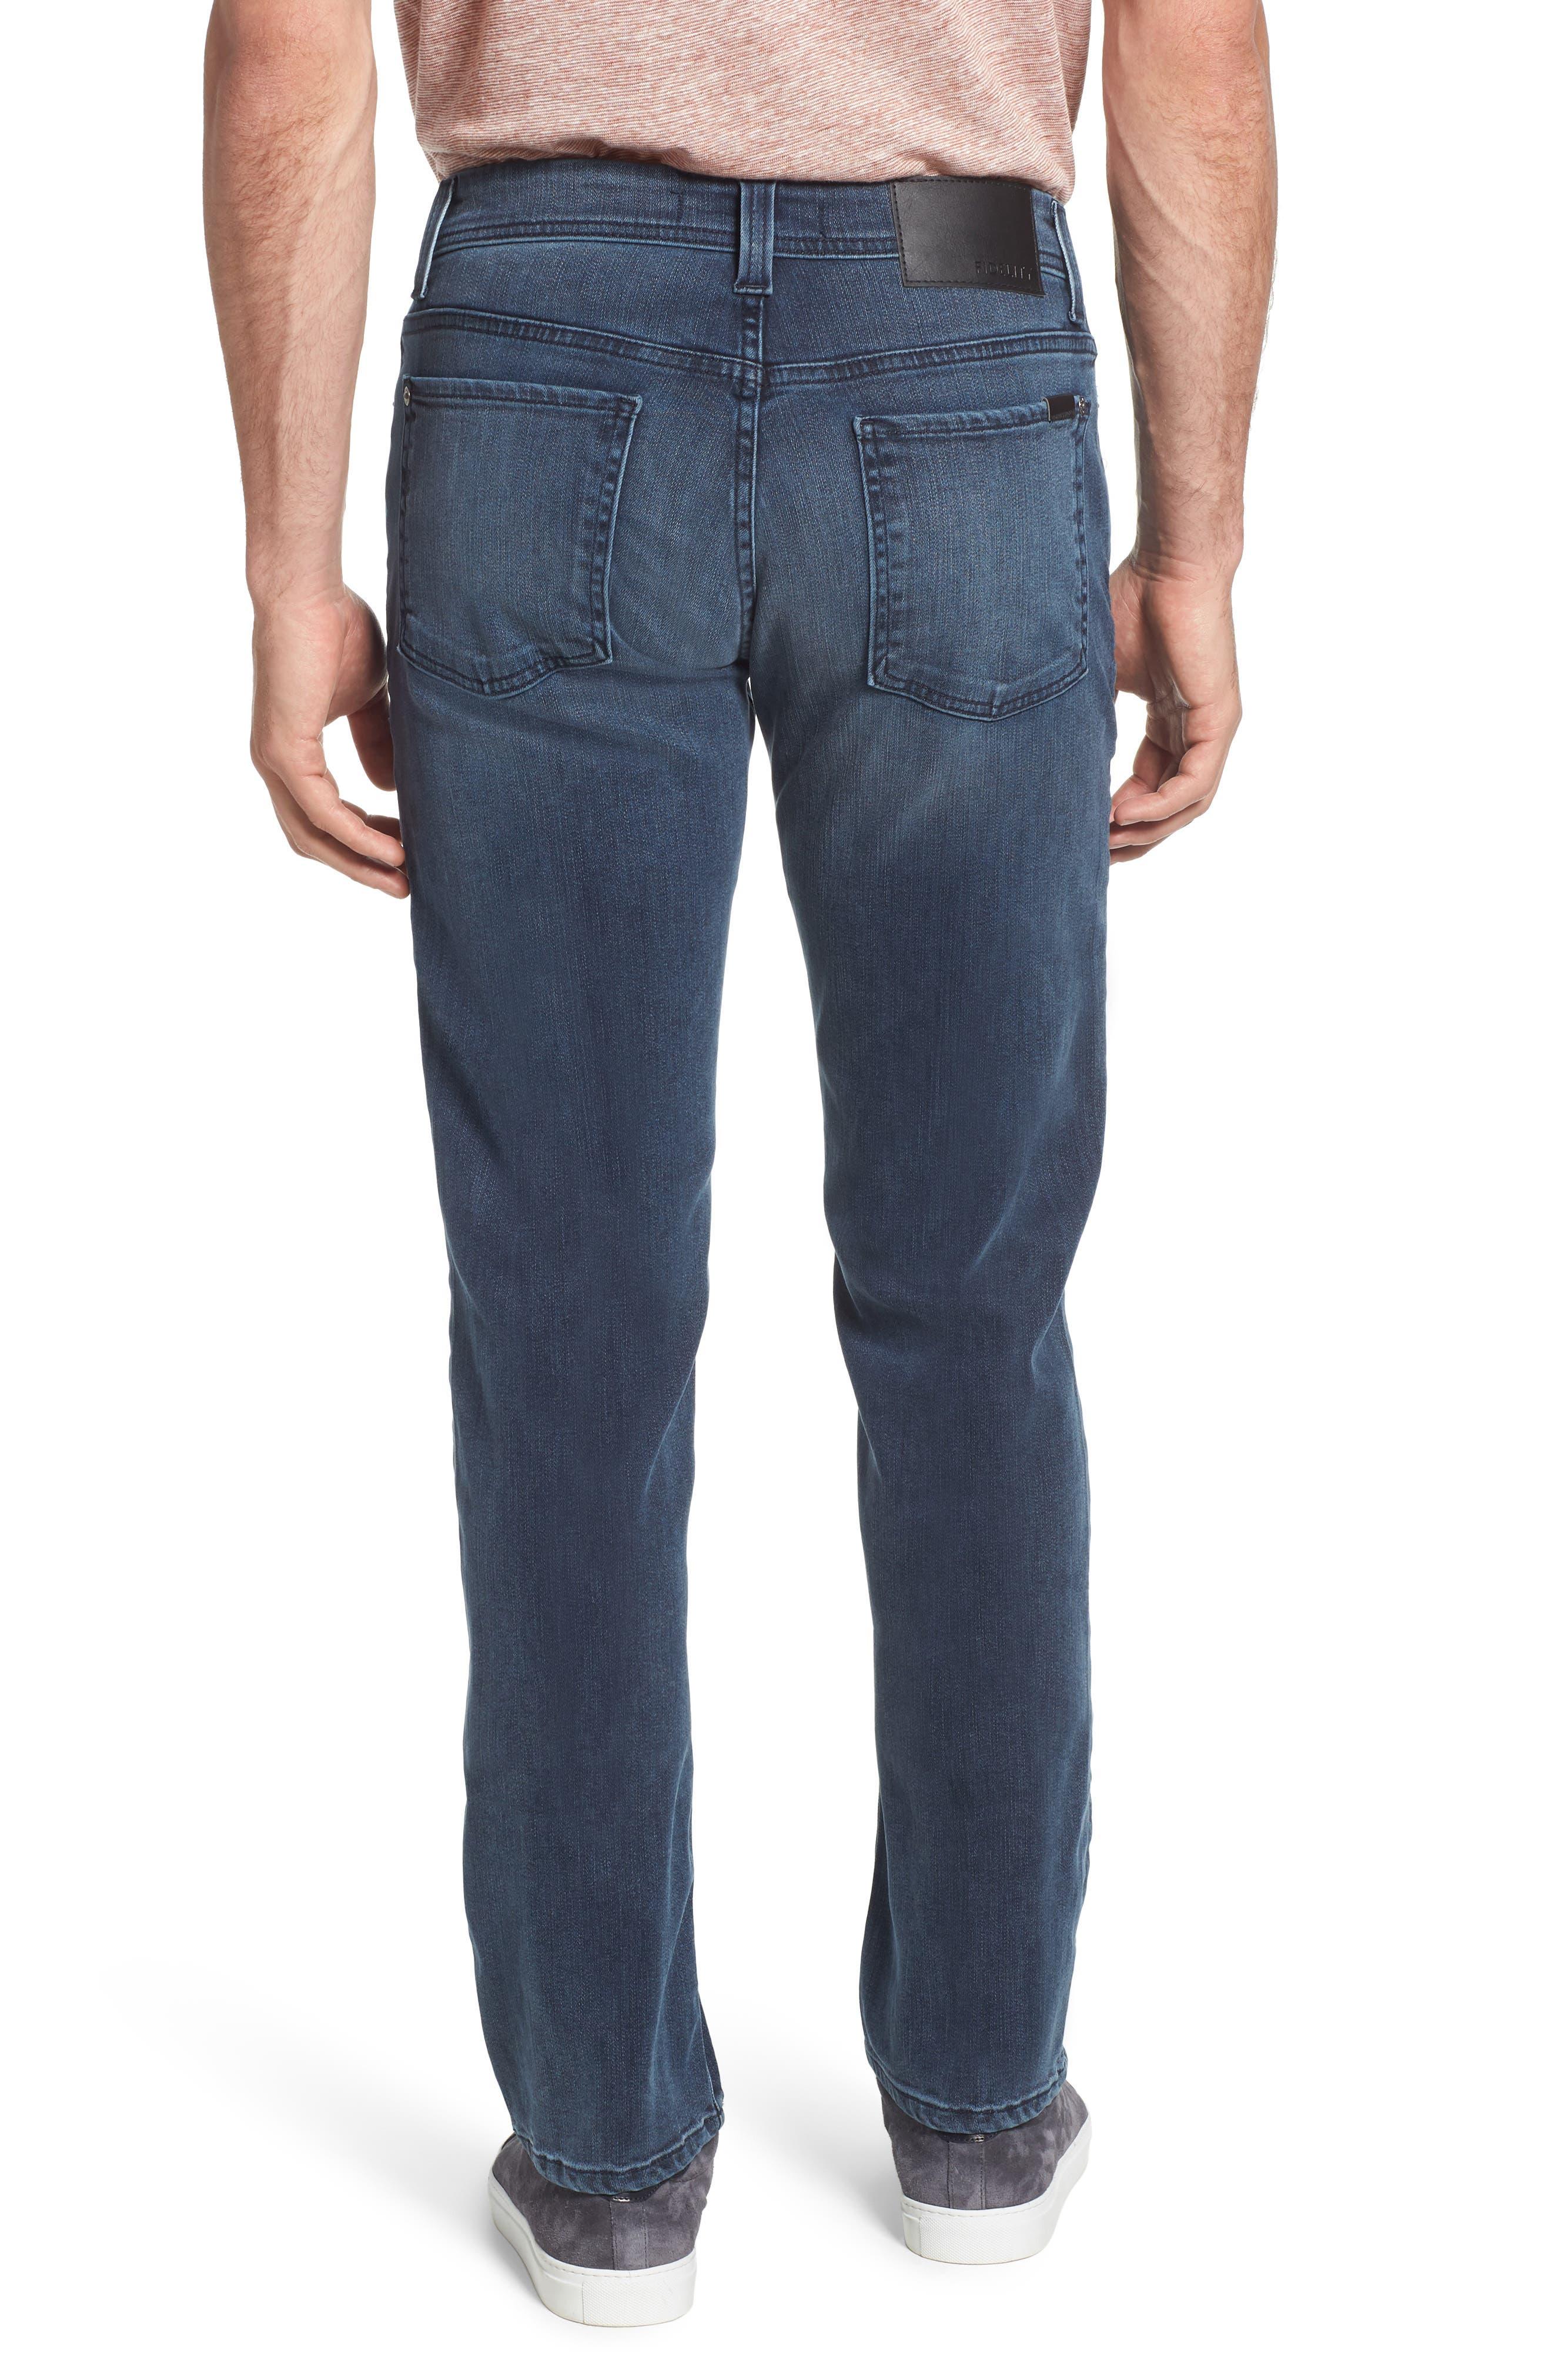 Jimmy Slim Straight Leg Jeans,                             Alternate thumbnail 2, color,                             Lexicon